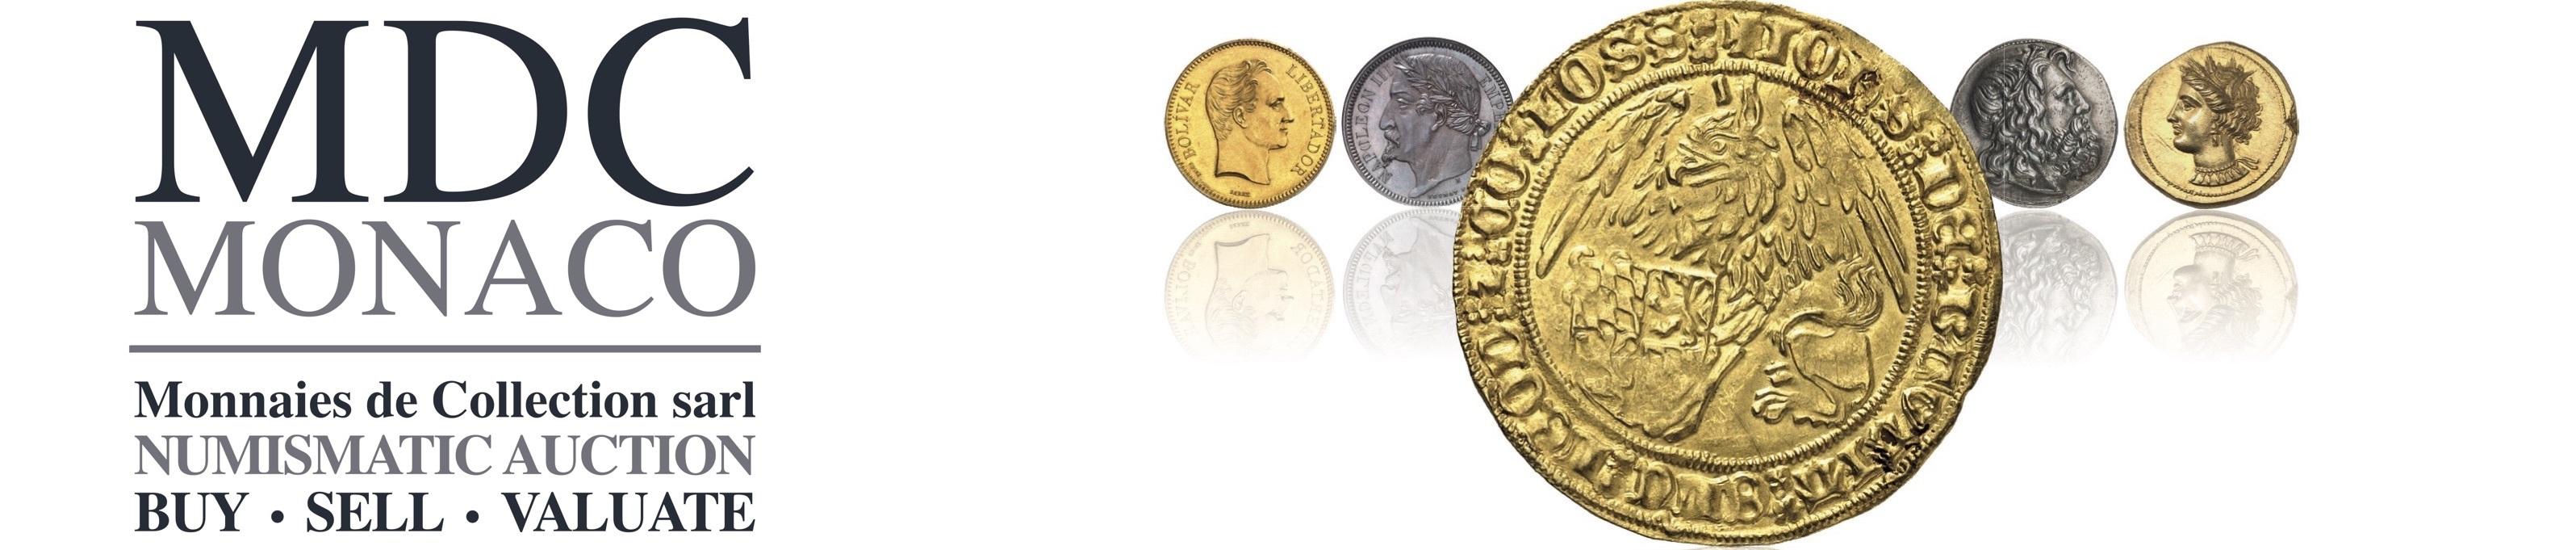 or numismatique Logo